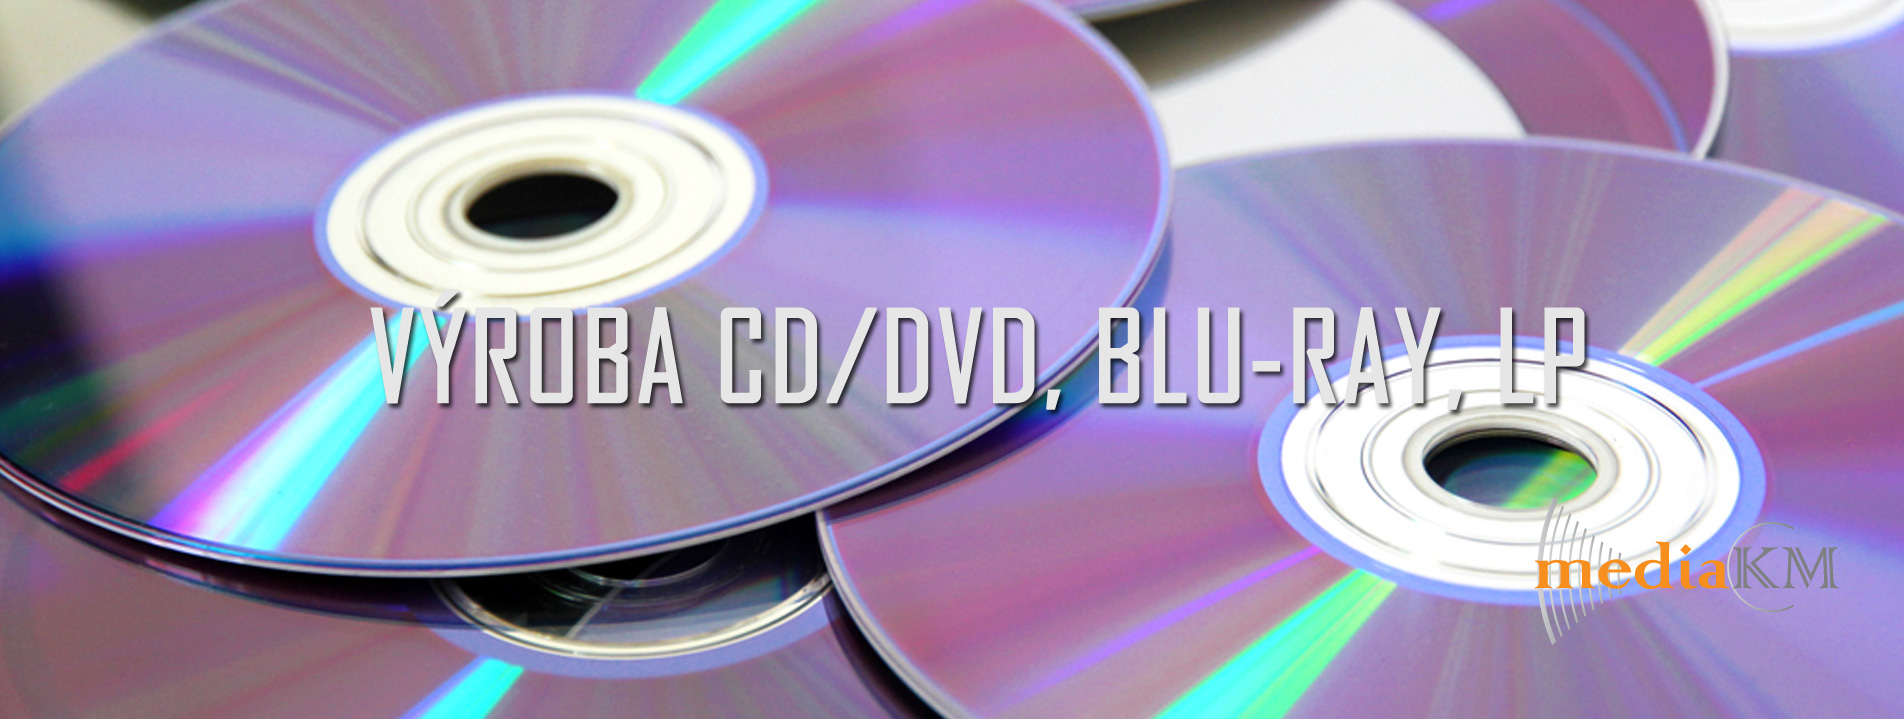 Výroba CD/DVD, BLU-RAY, LP - vinyl deska